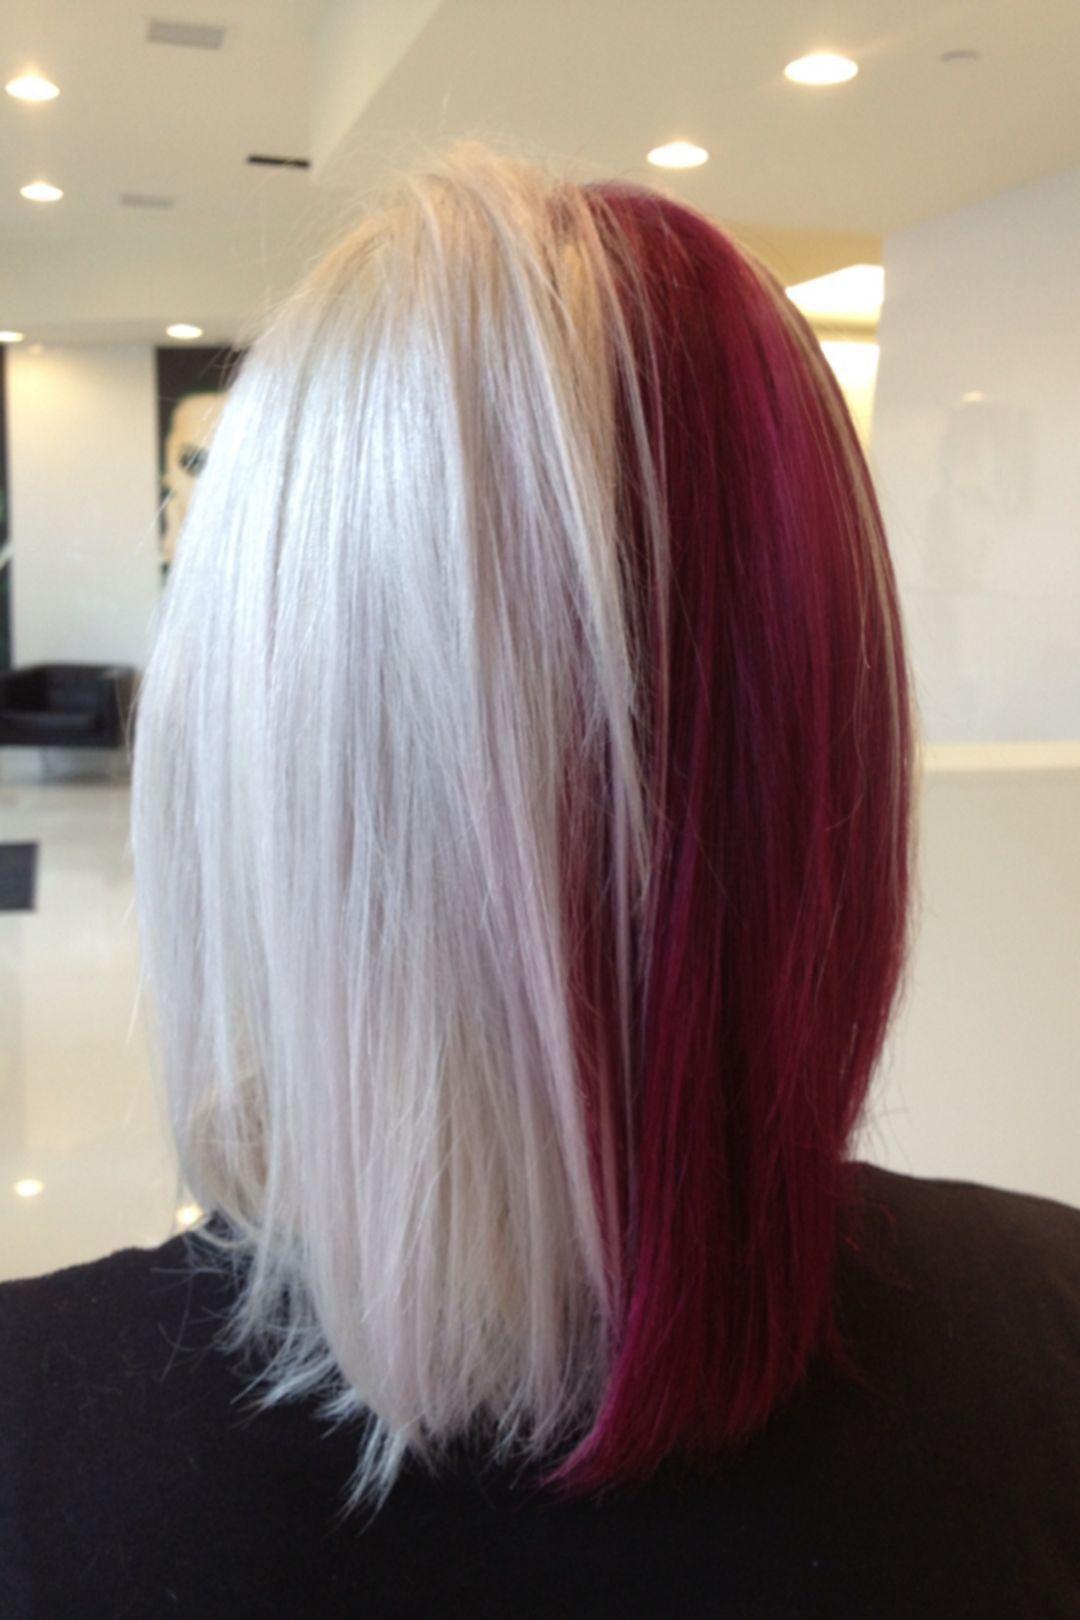 Half and half hair color hair coloring half dyed hair and dye hair